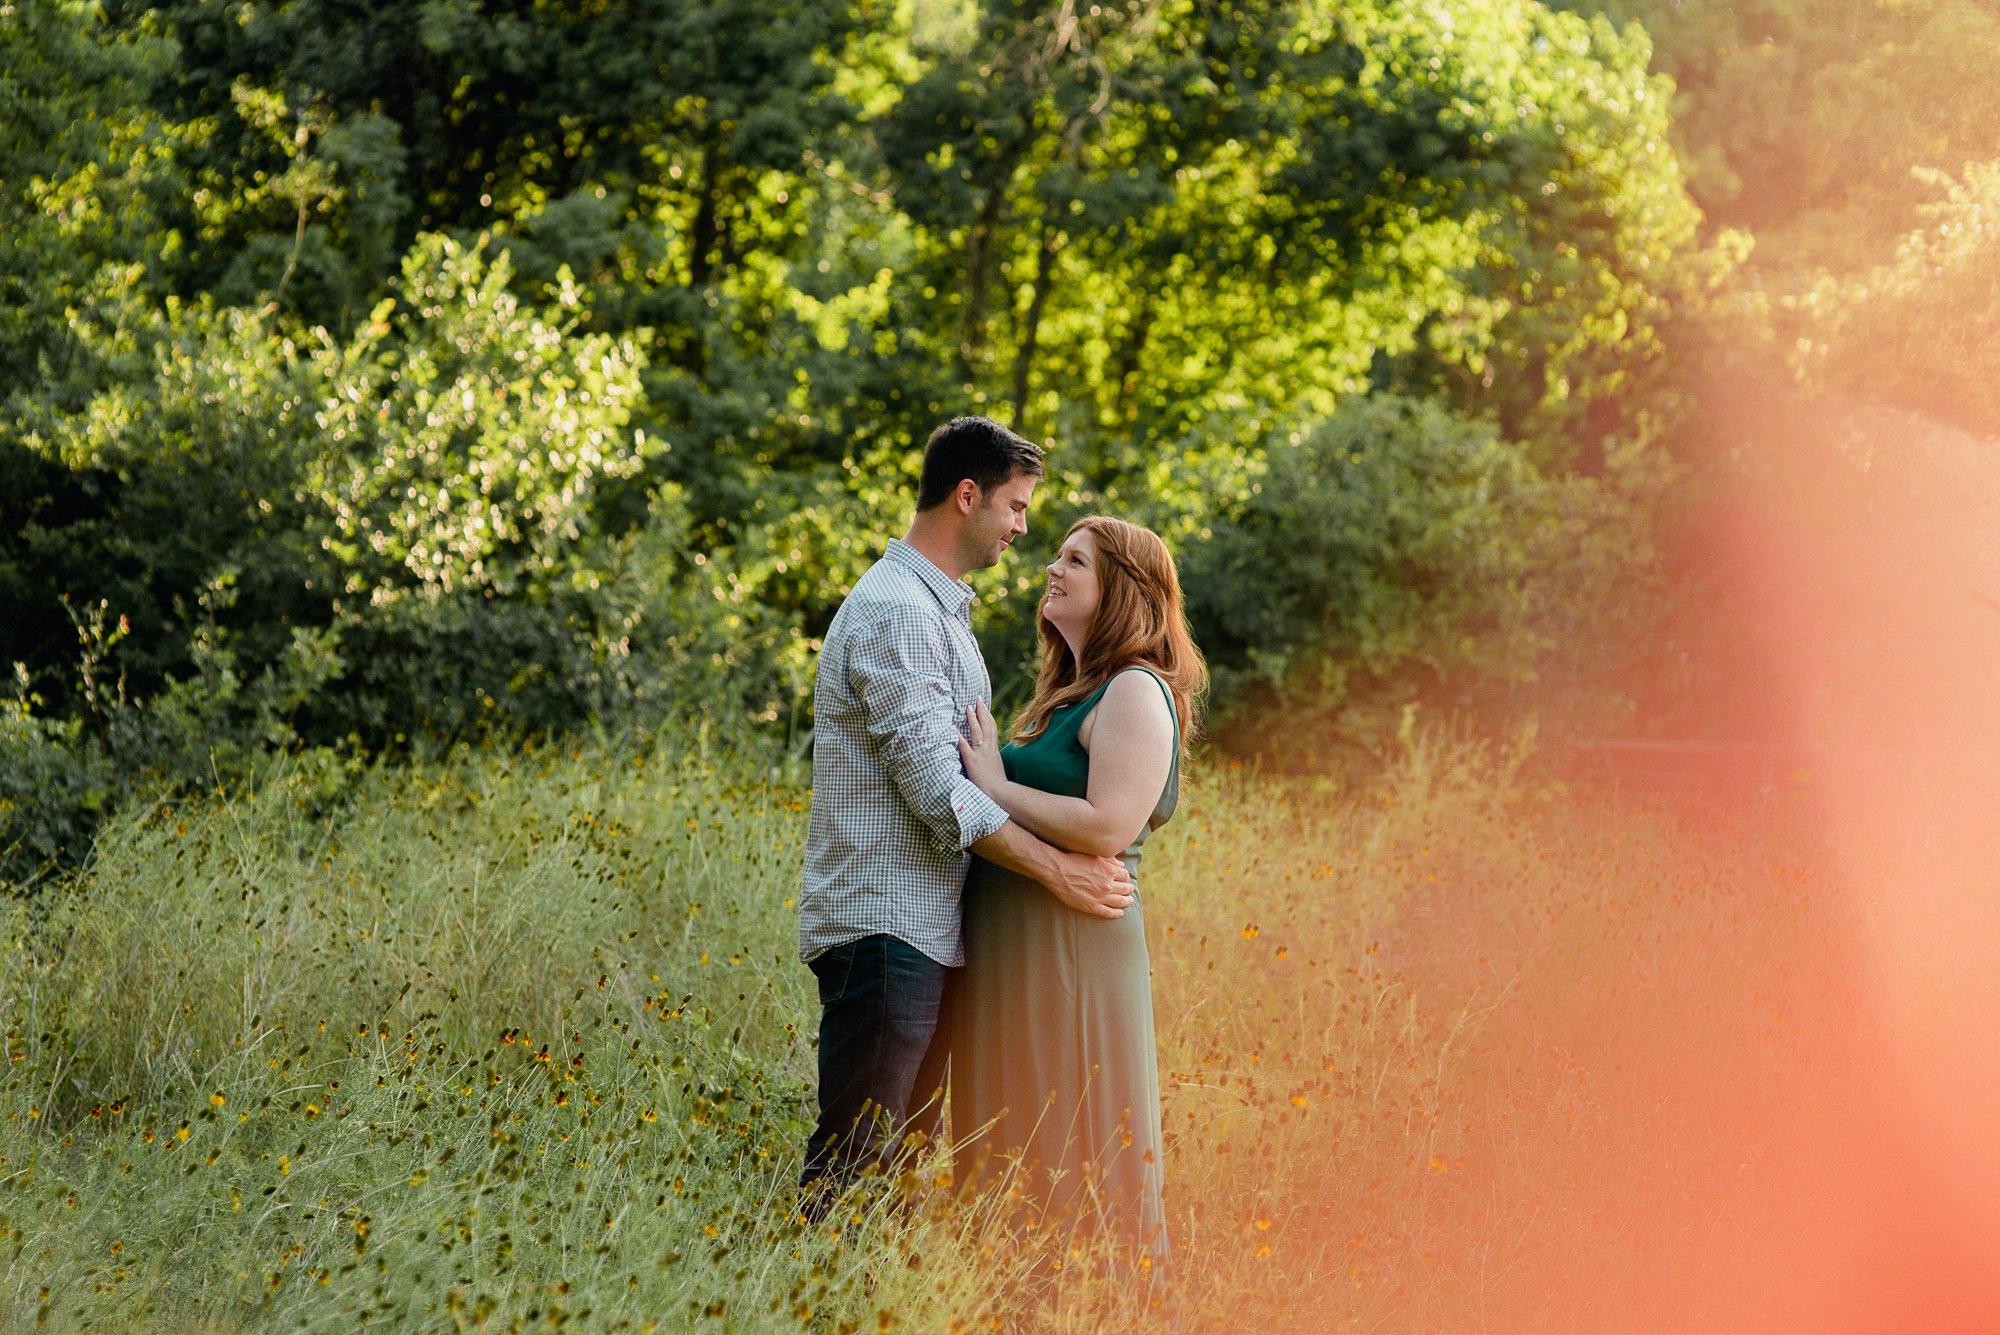 austin engagement session, brushy creek park engagement session, prism effect wedding portraits